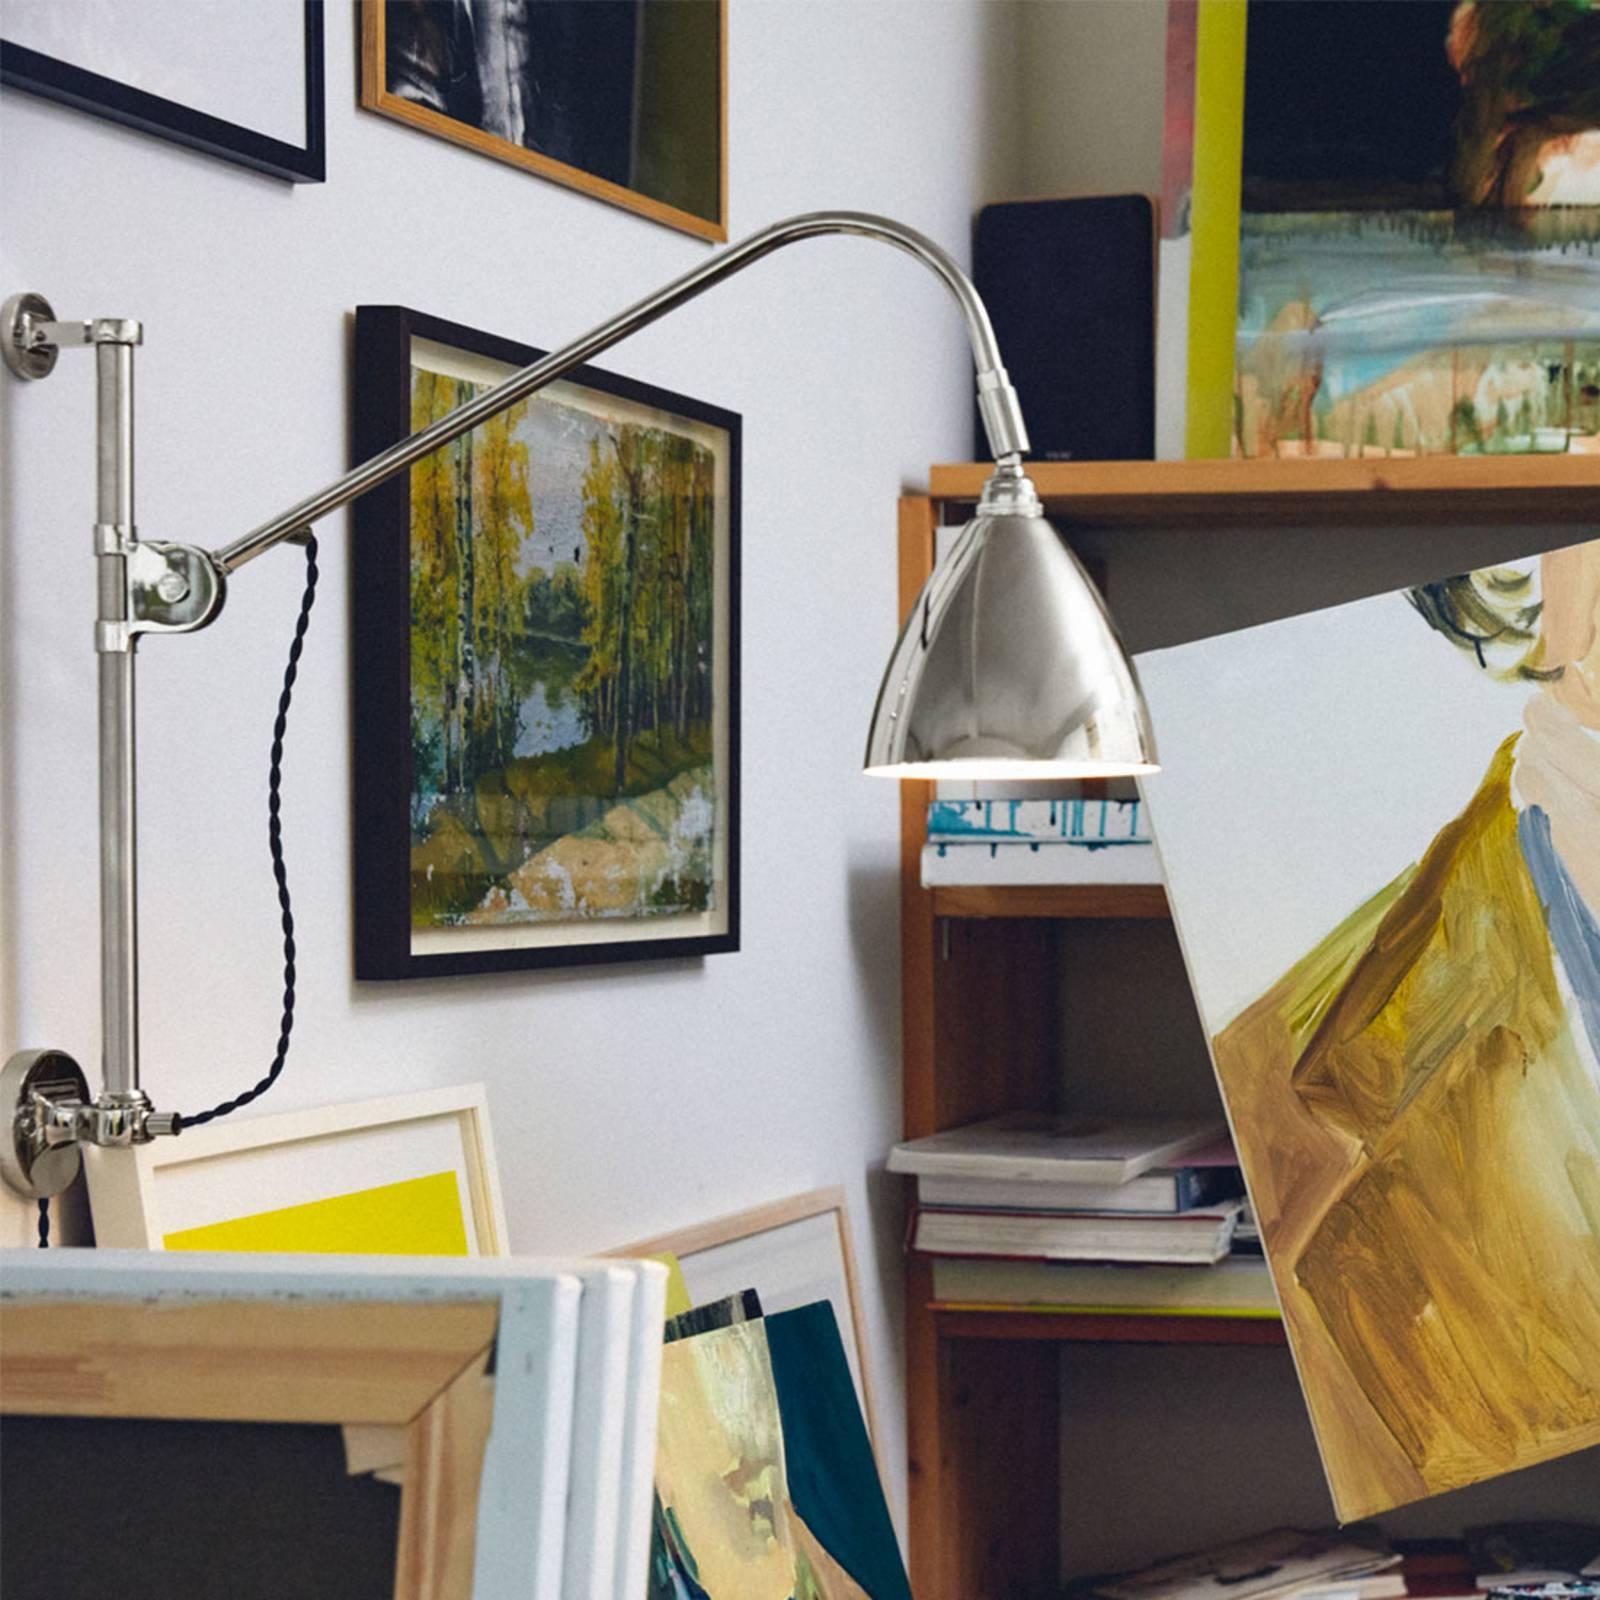 GUBI Bestlite BL5 wandlamp, gelimiteerd, nikkel